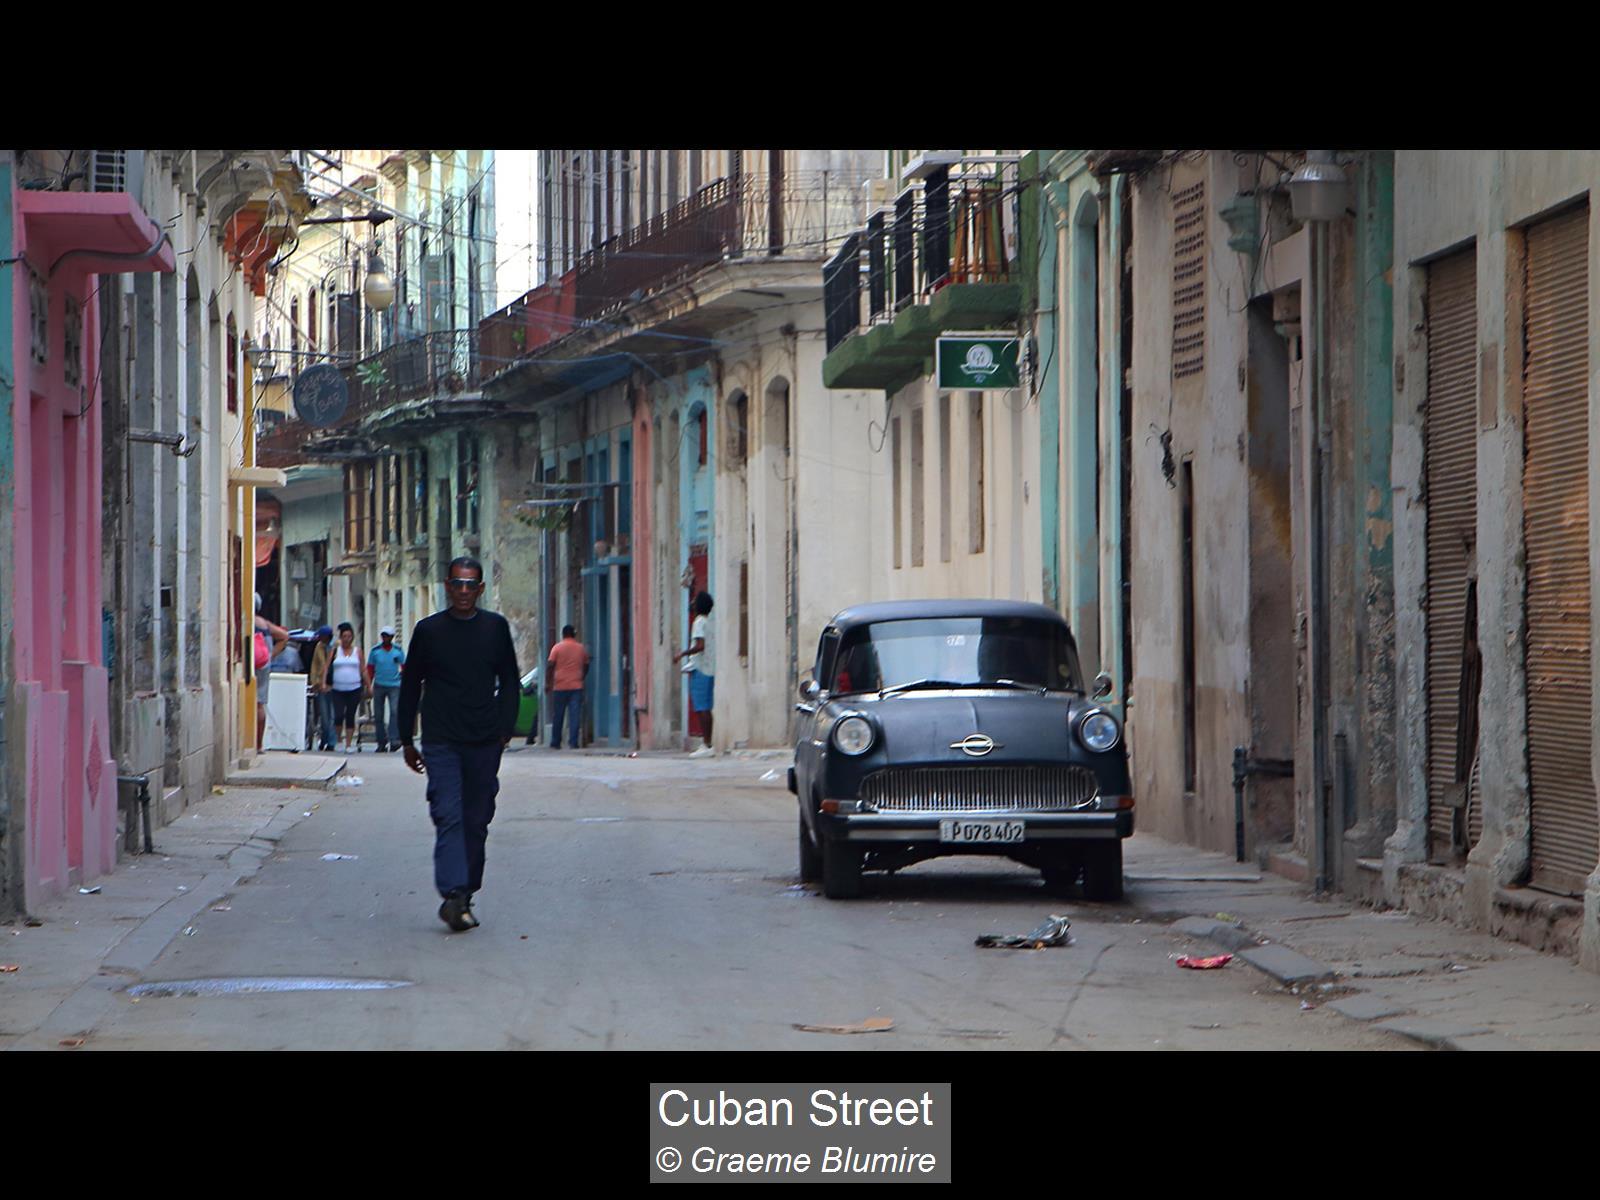 Graeme Blumire_Cuban Street_None